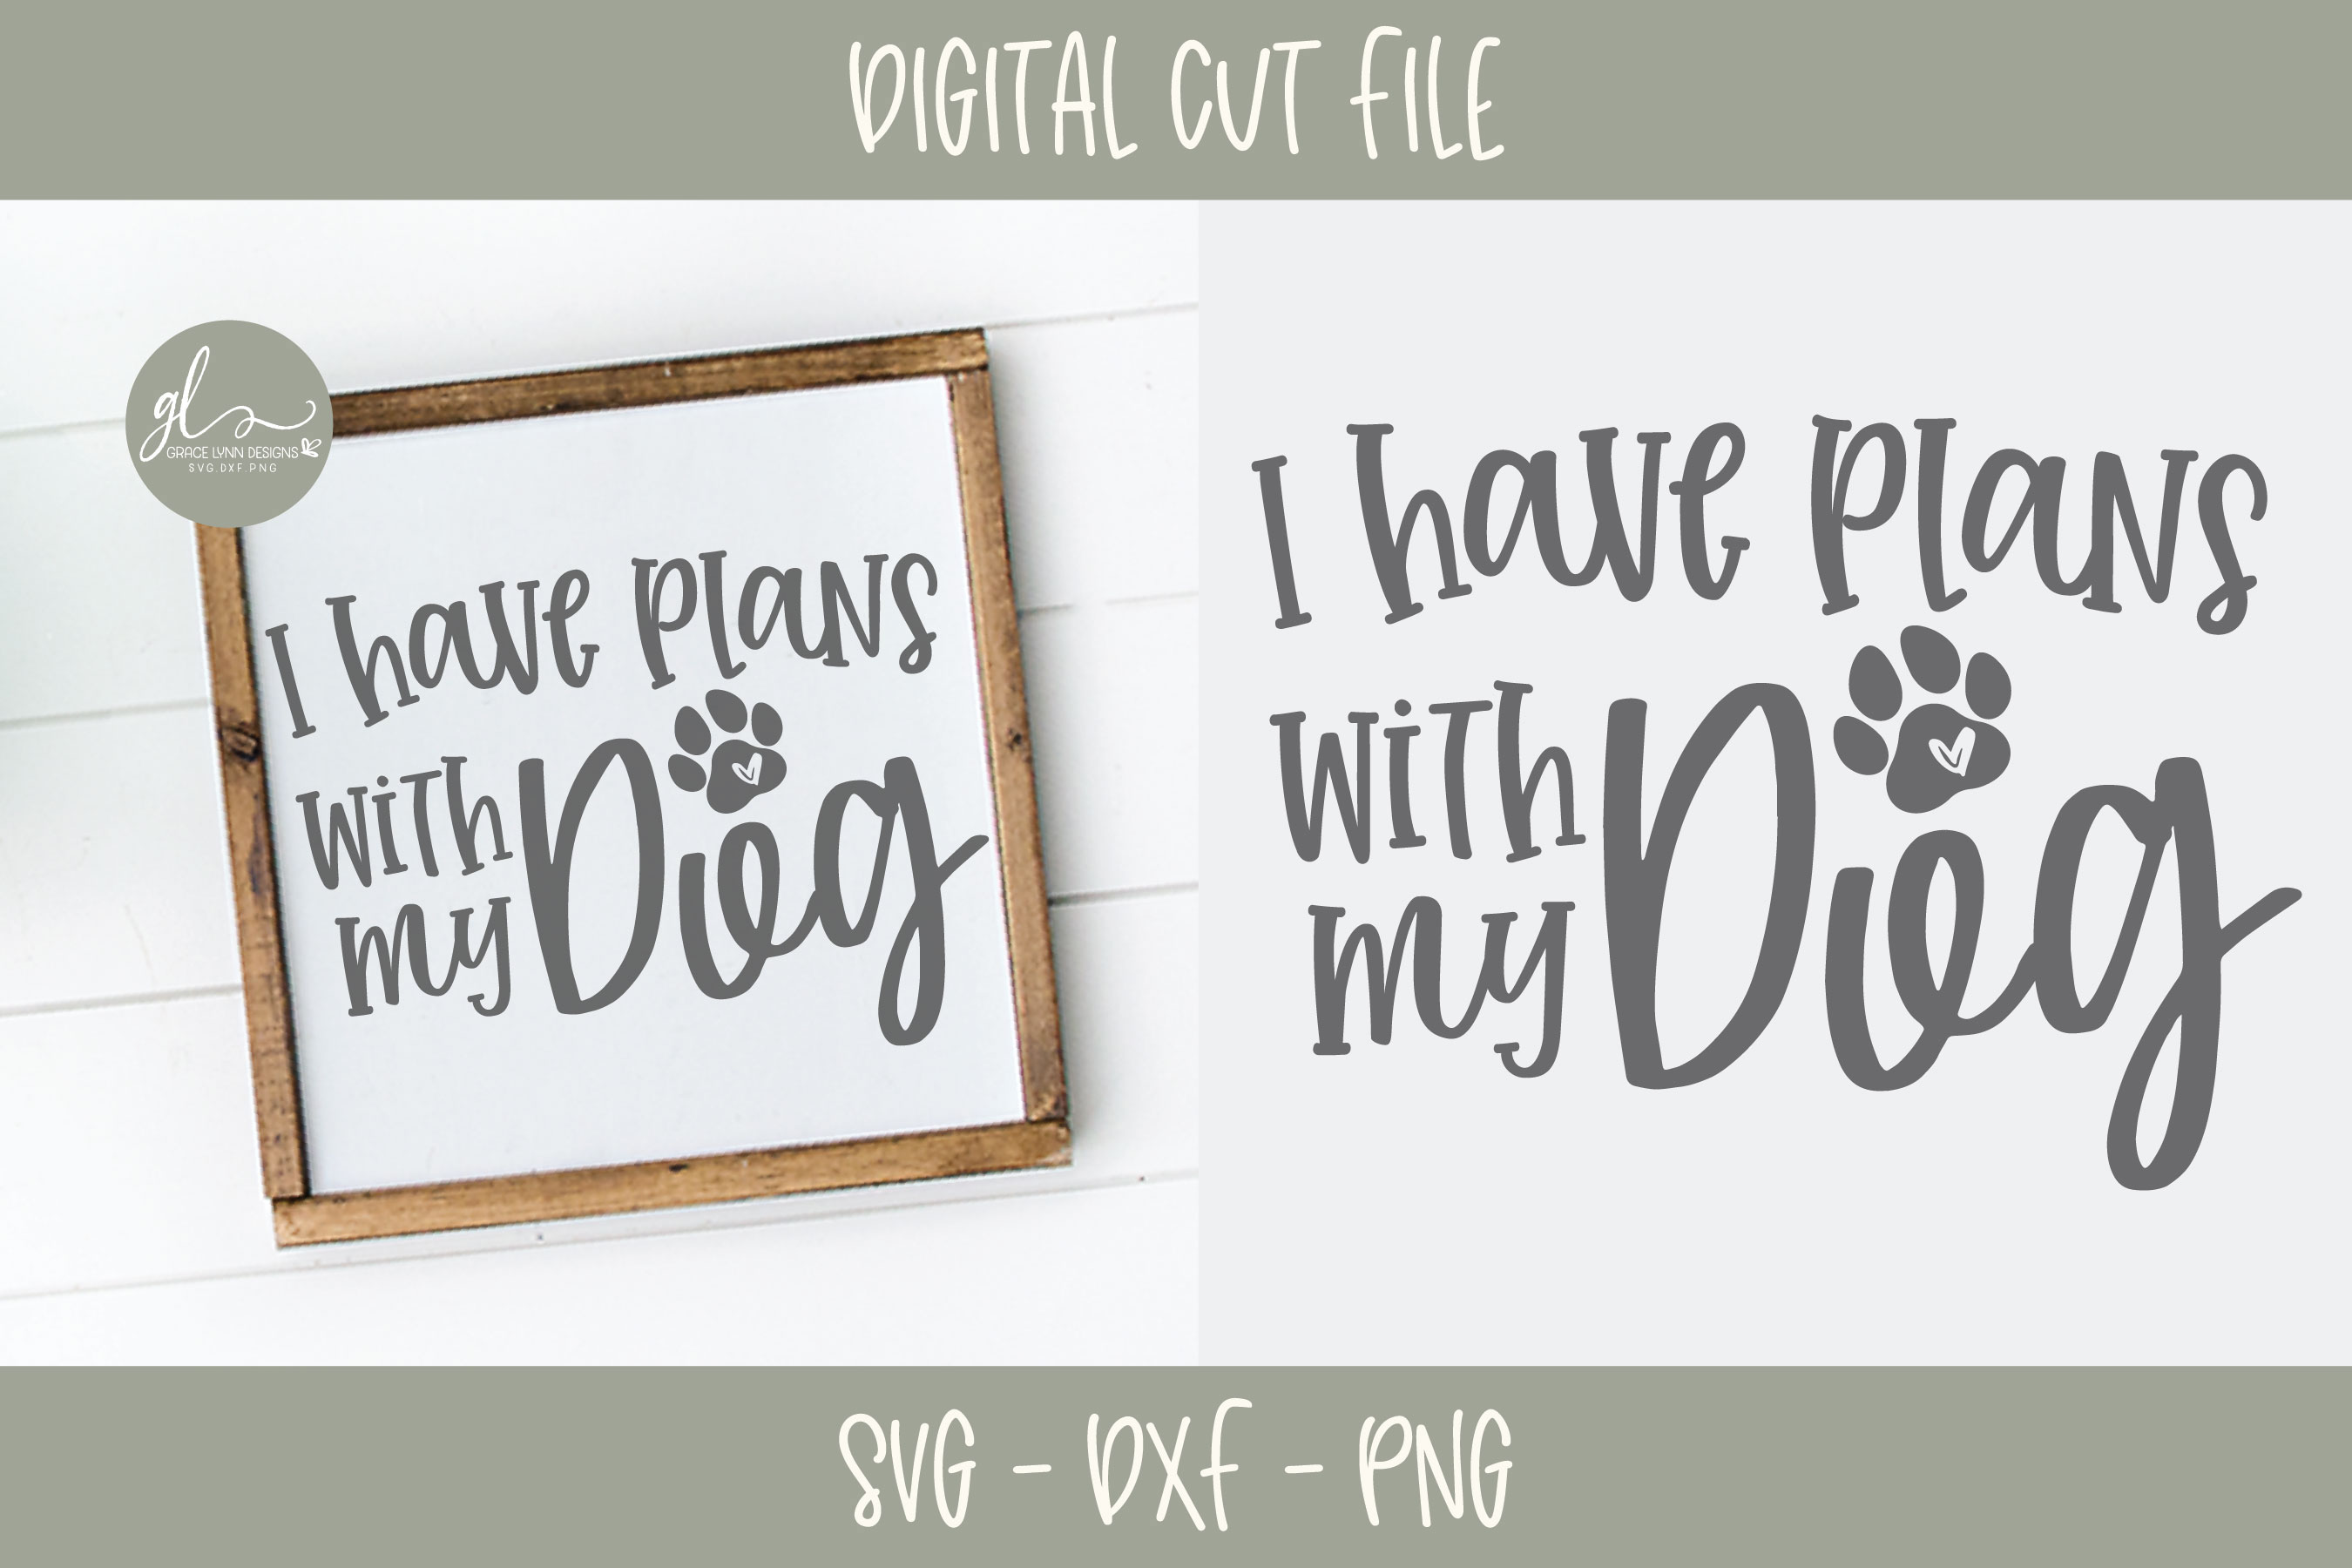 Dog Quotes Bundle Vol. 2 - 10 Designs - SVG Cut Files example image 9